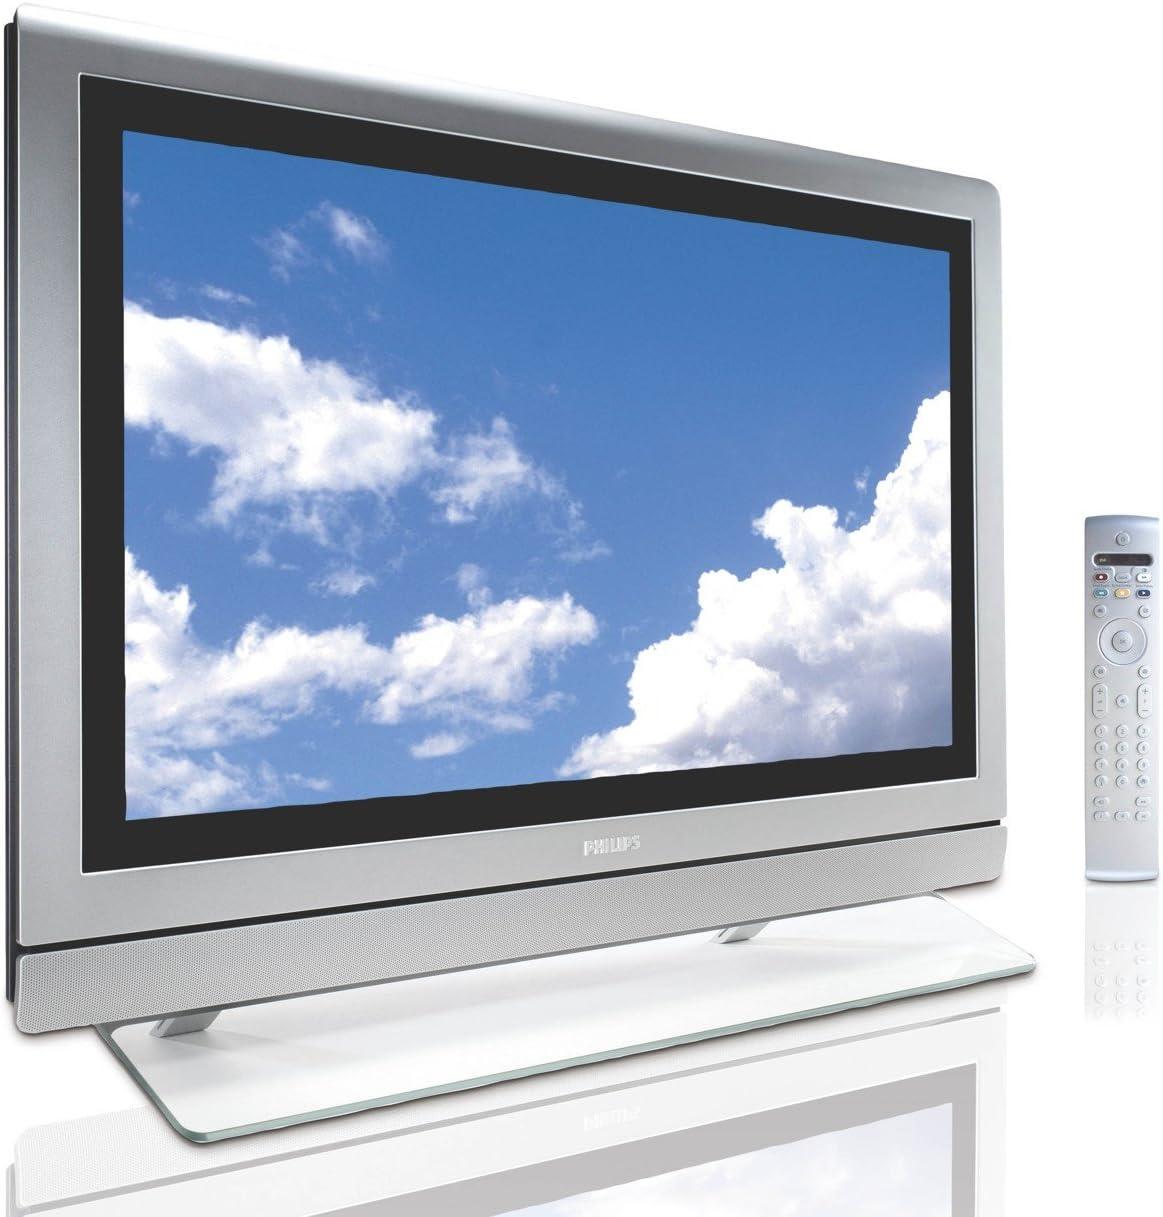 Philips 32 PF 9976 - Televisión, Pantalla LCD 32 pulgadas- Plata ...